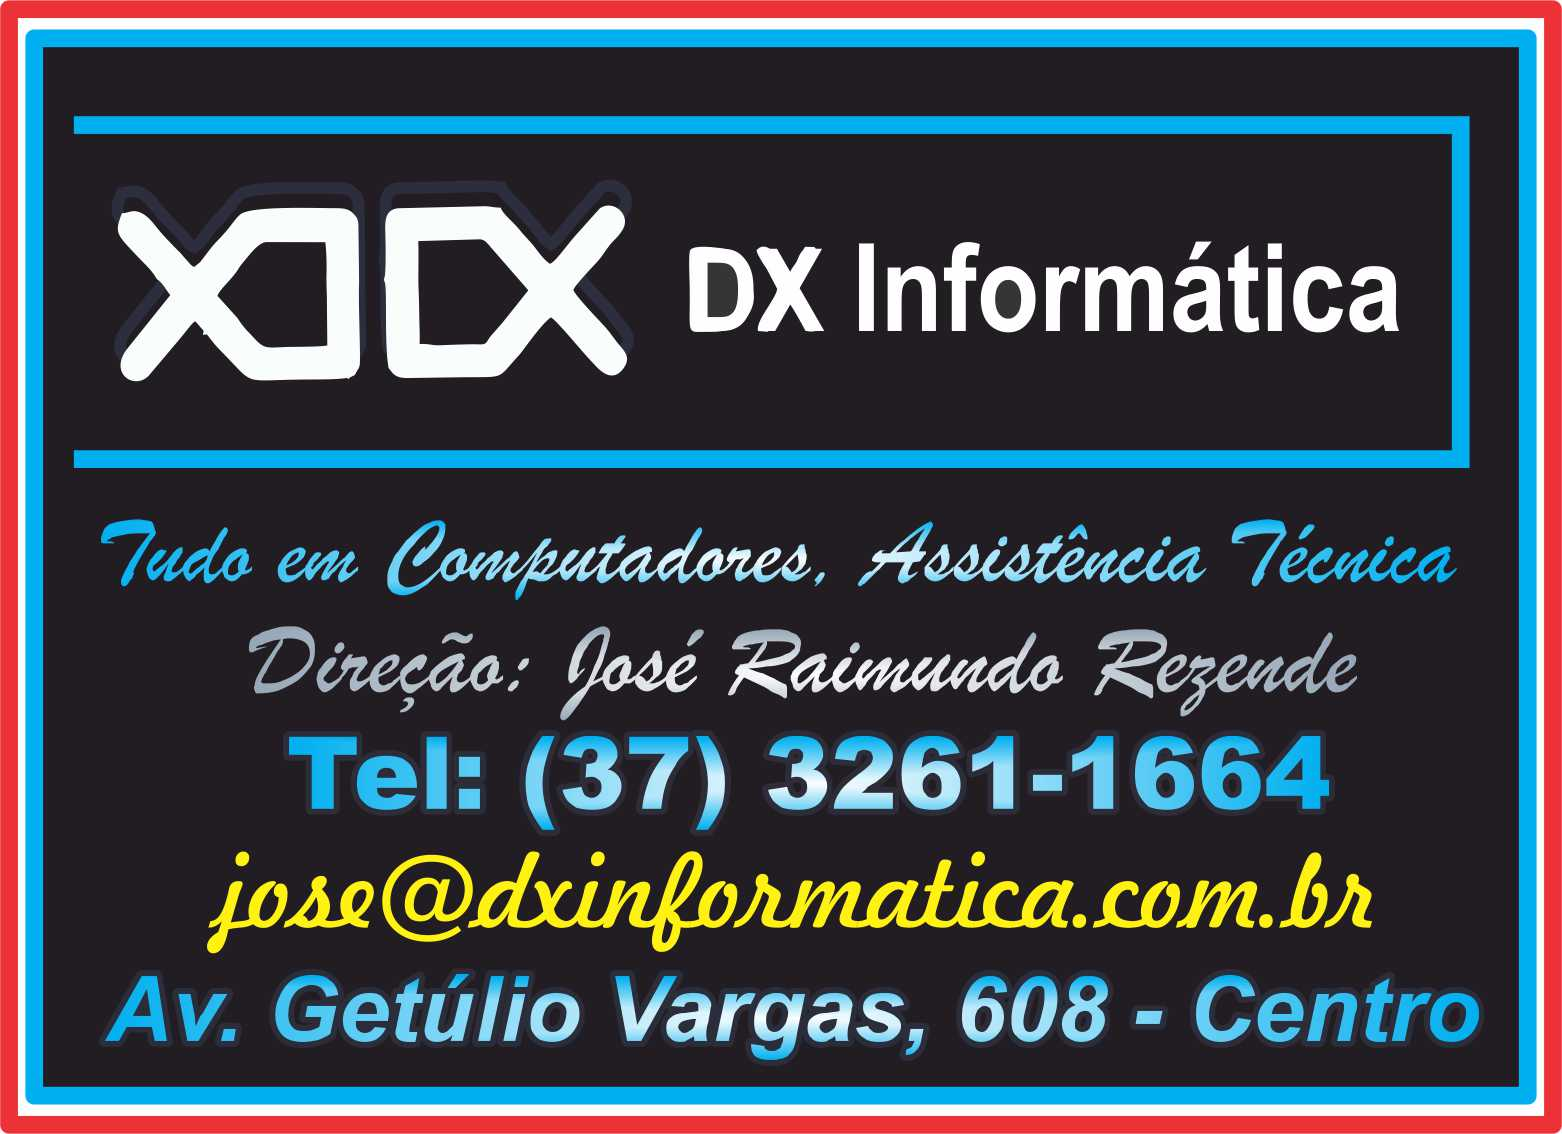 DX Informática